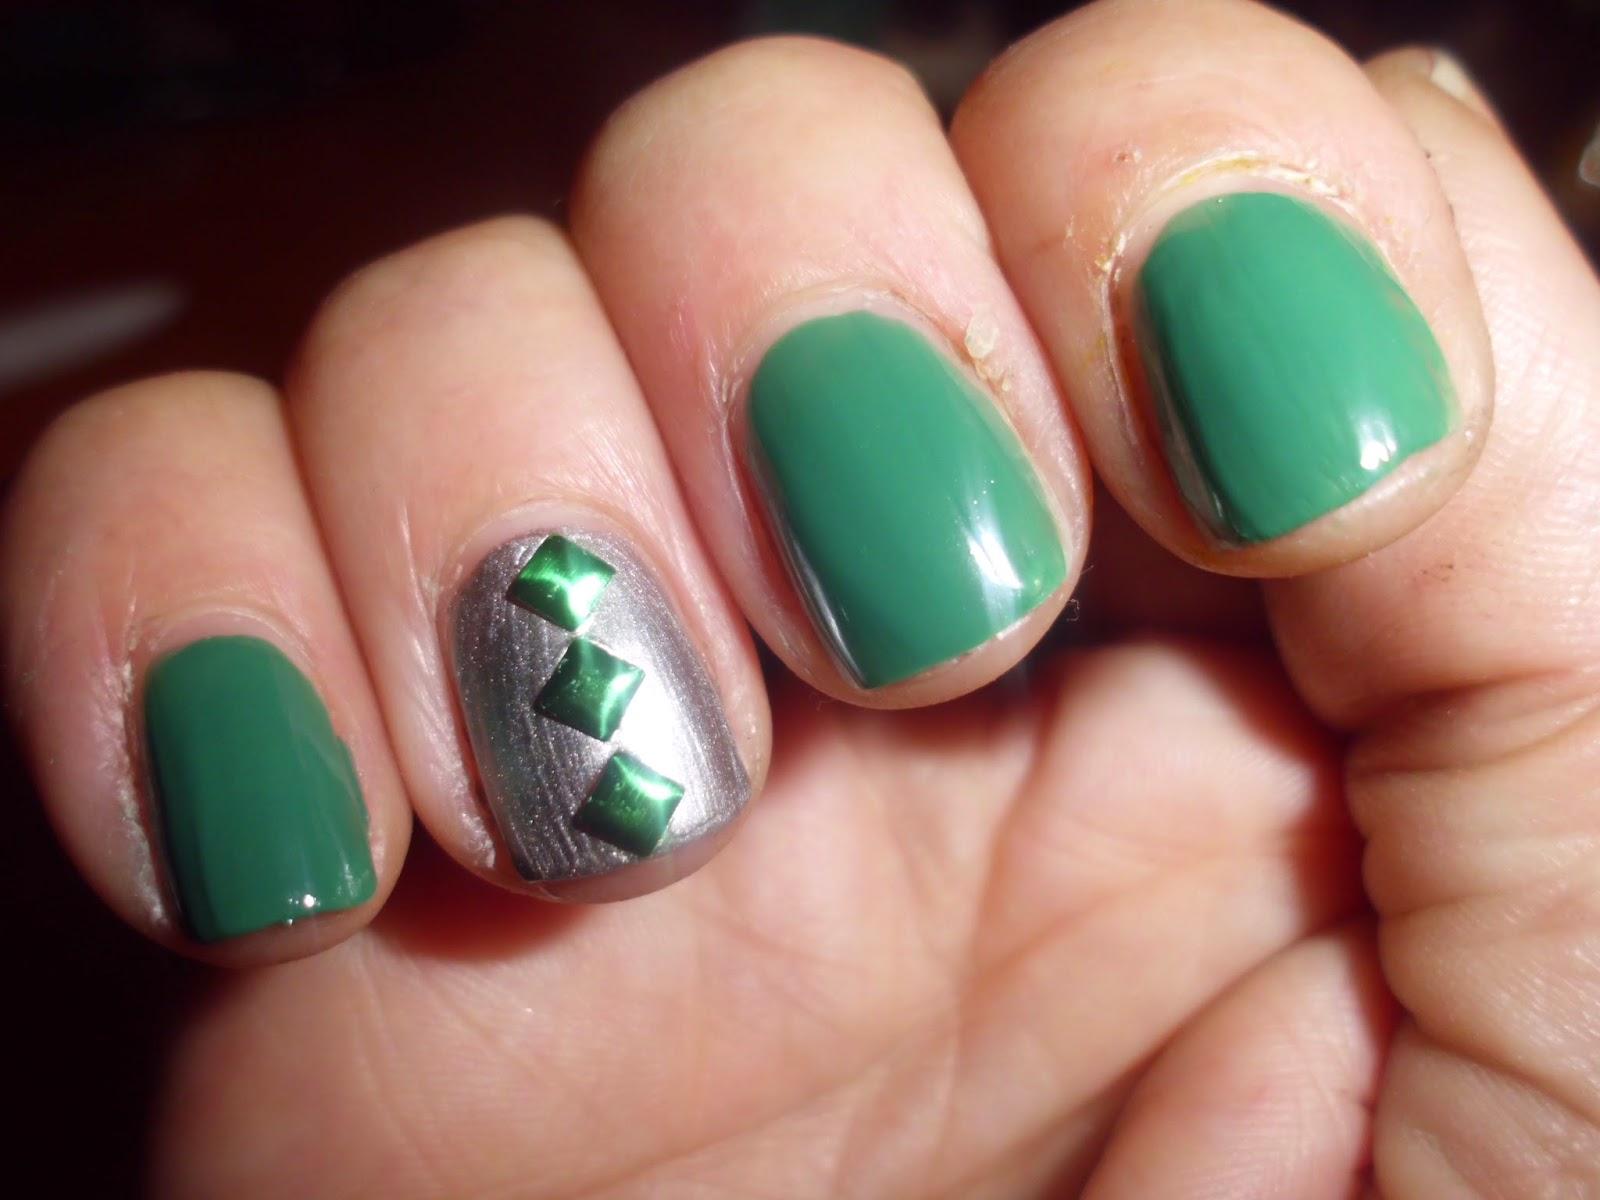 Manicura verde con tachuelas